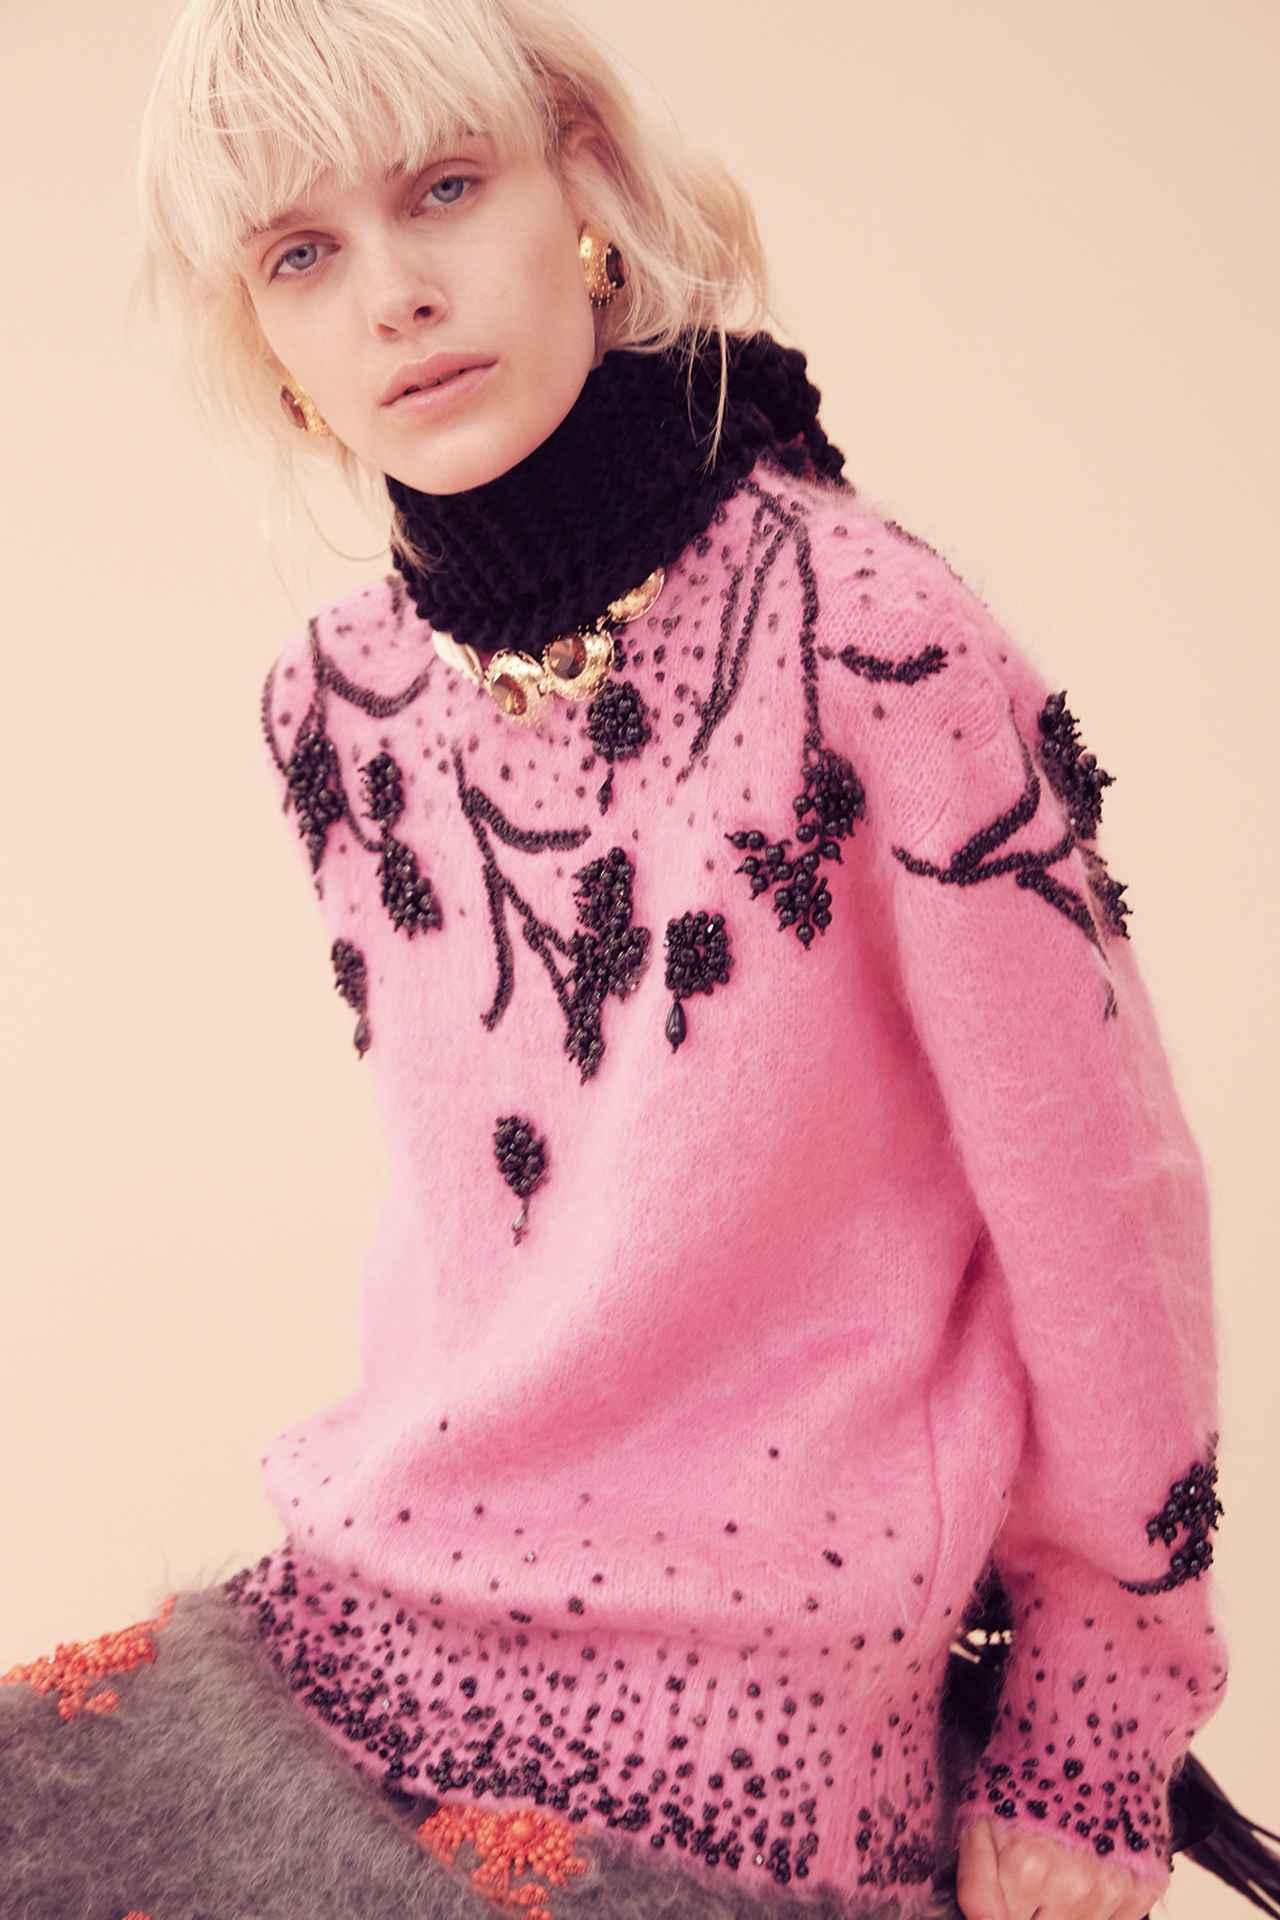 Images : 6番目の画像 - 「洗練のピンク」のアルバム - T JAPAN:The New York Times Style Magazine 公式サイト